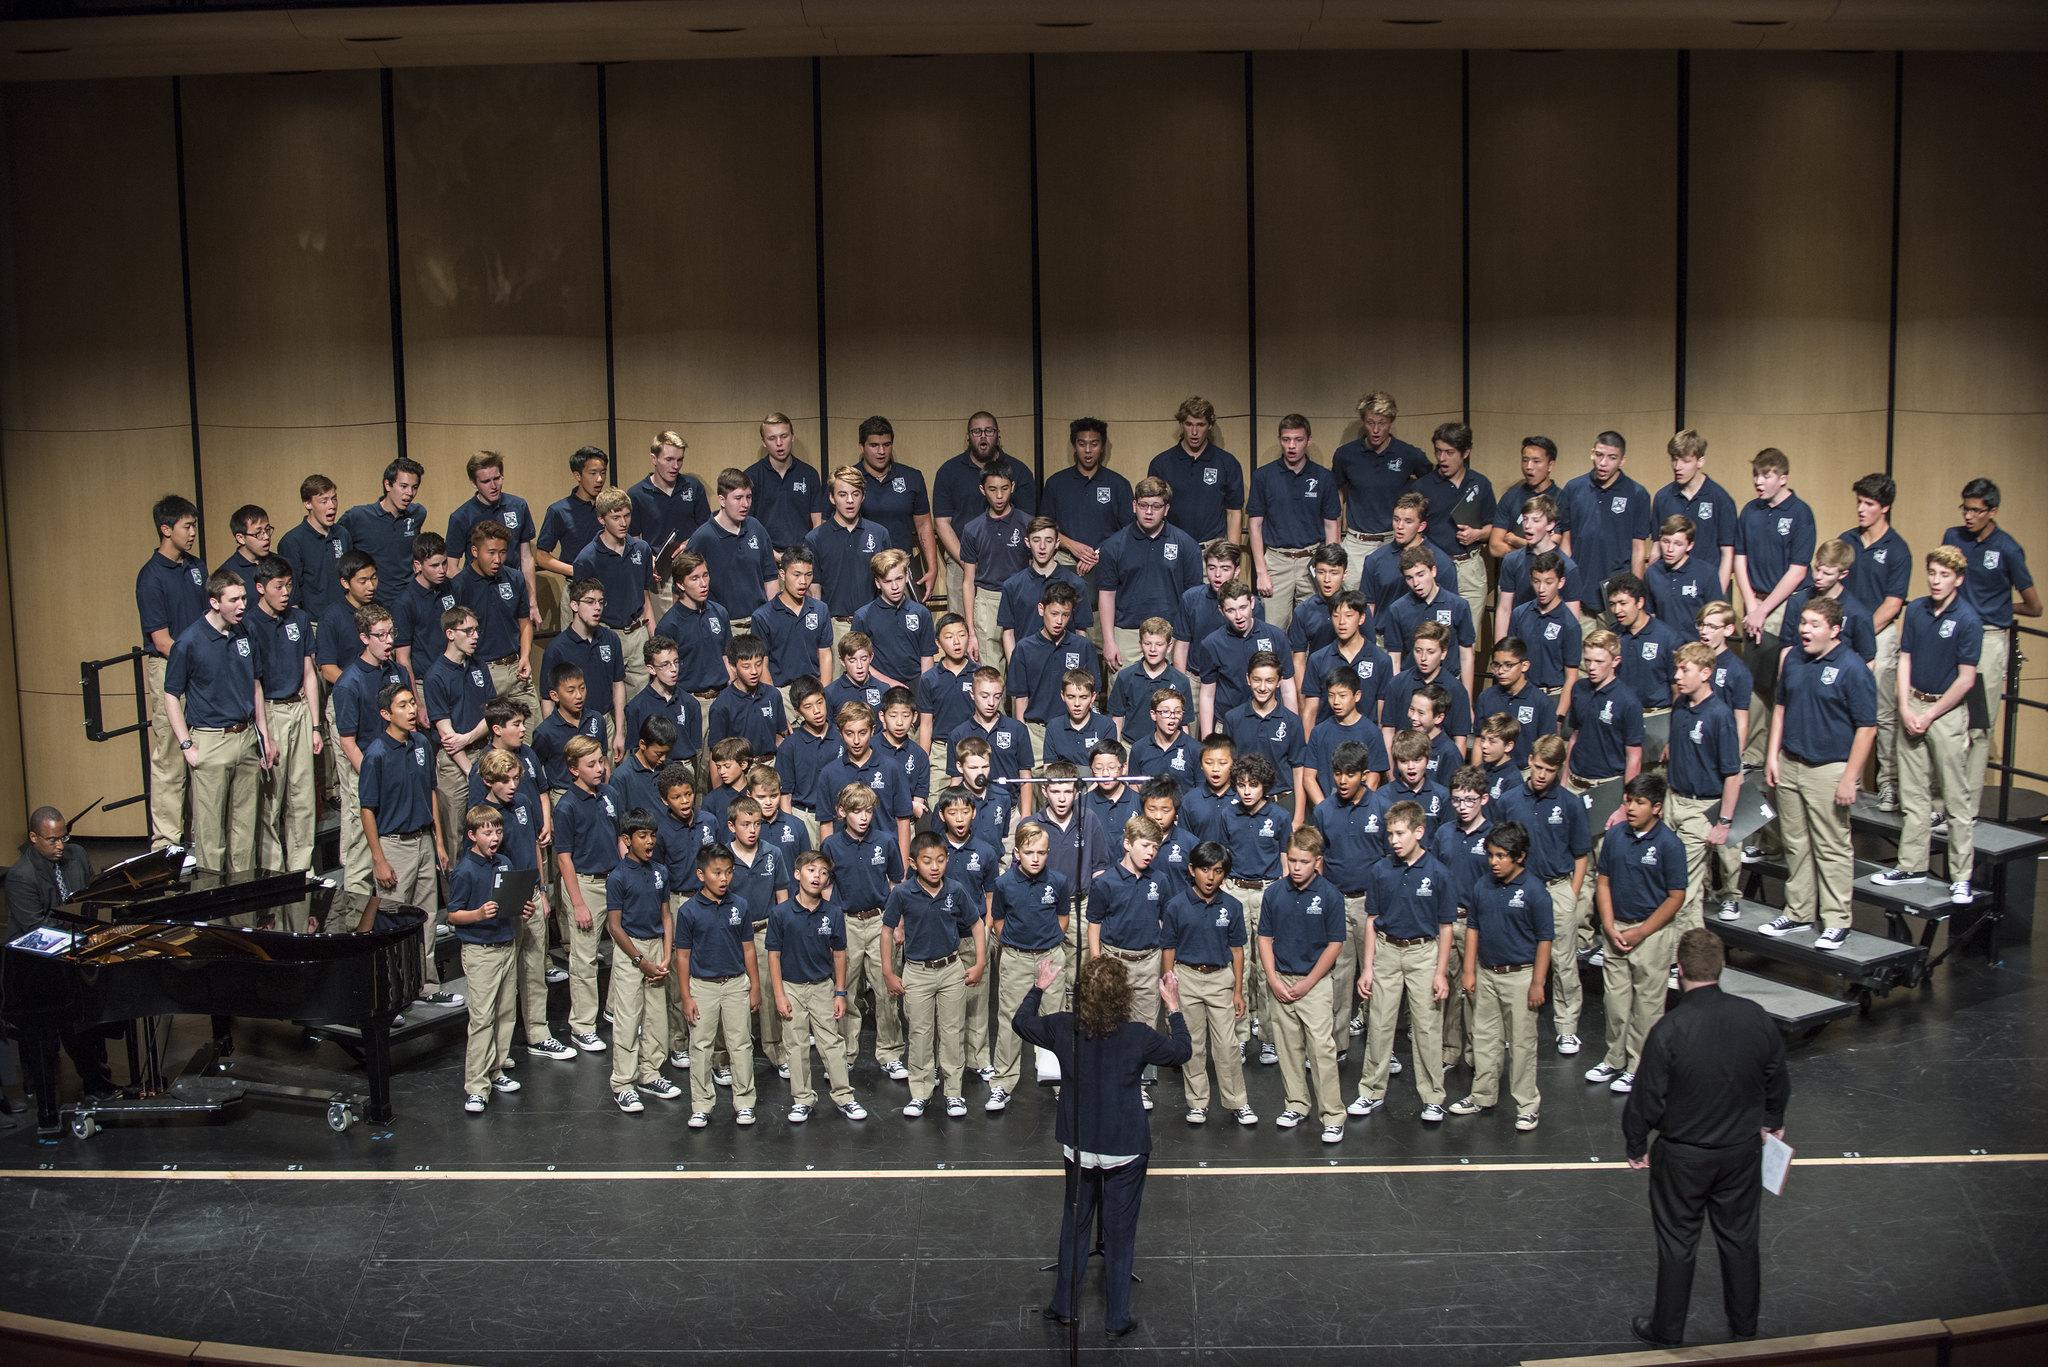 Cultura Zapopan invita al concierto del grupo coral californiano Ragazzi Boy Chorus